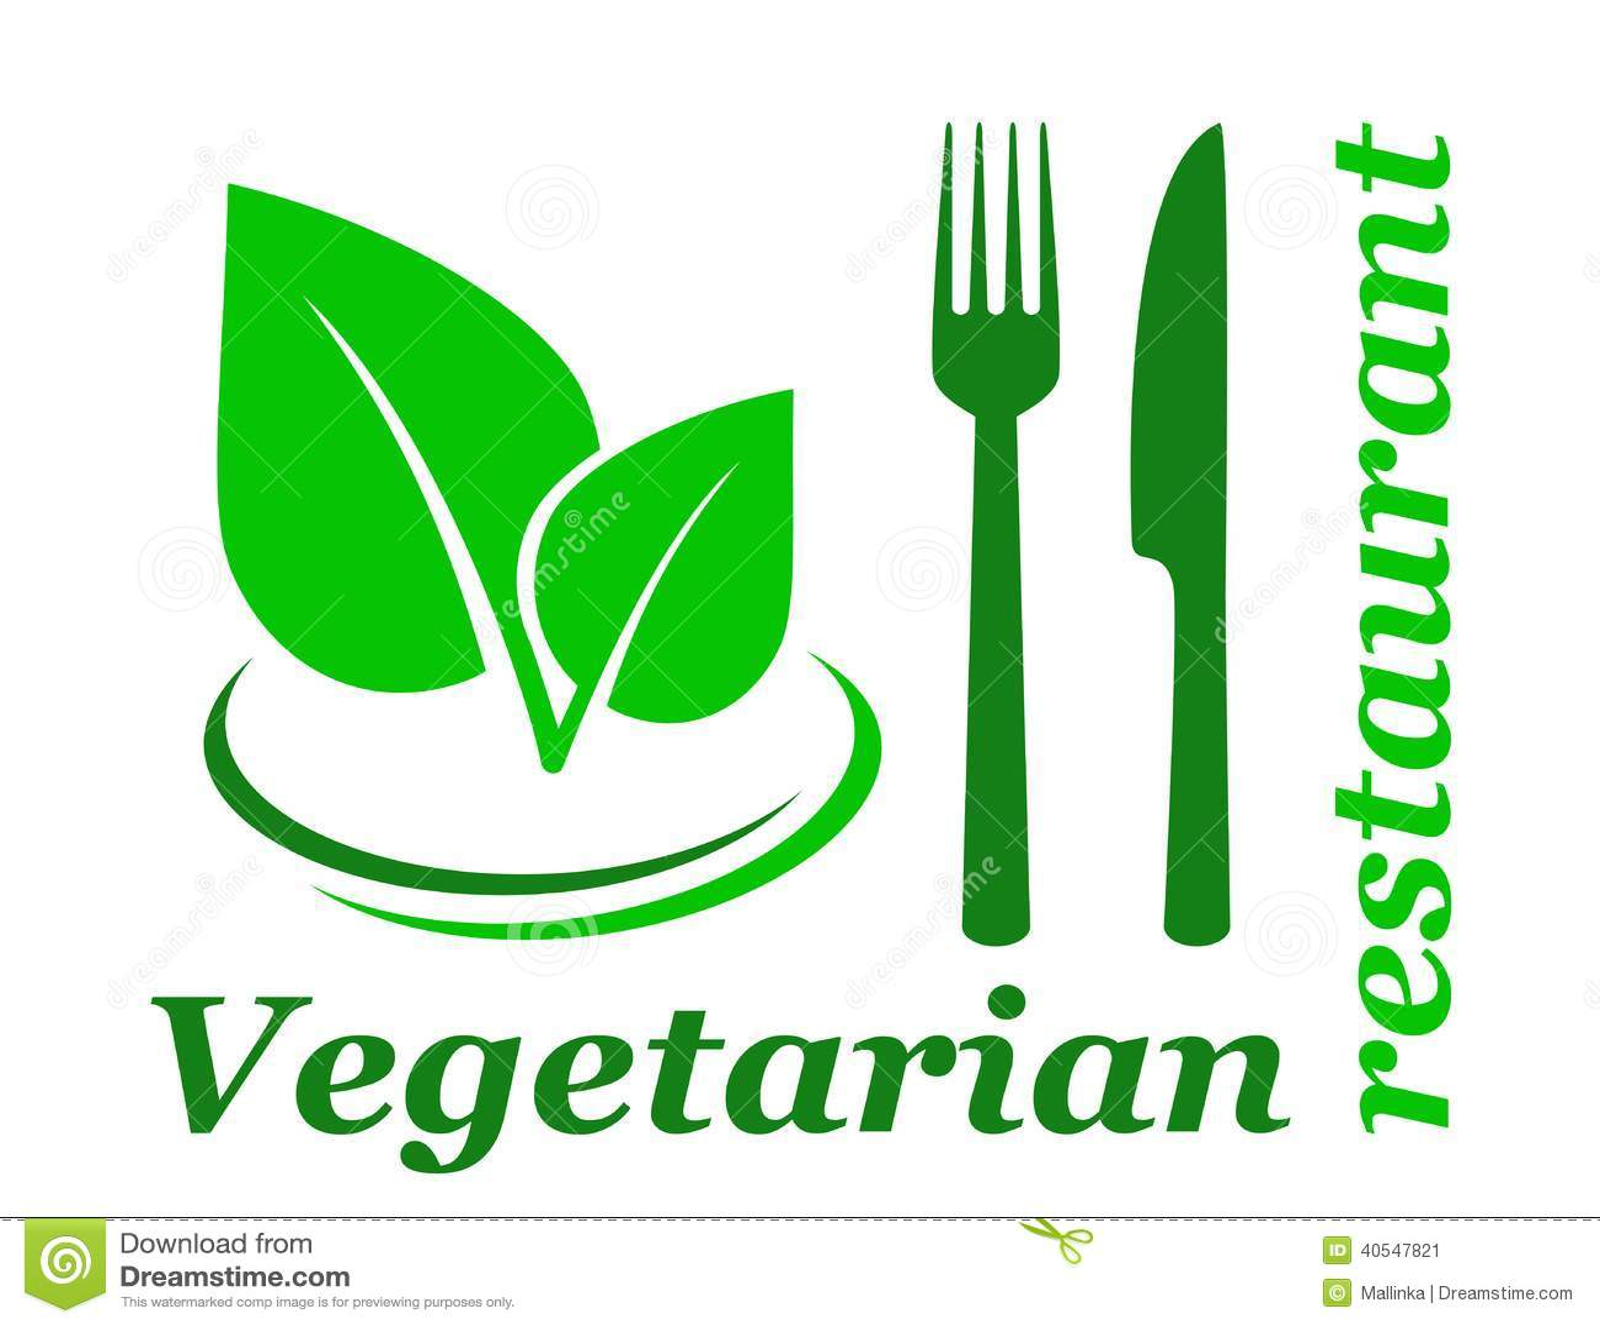 Vegetarian restaurant sign stock vector image 40547821 - Green vegetarian cuisine ...